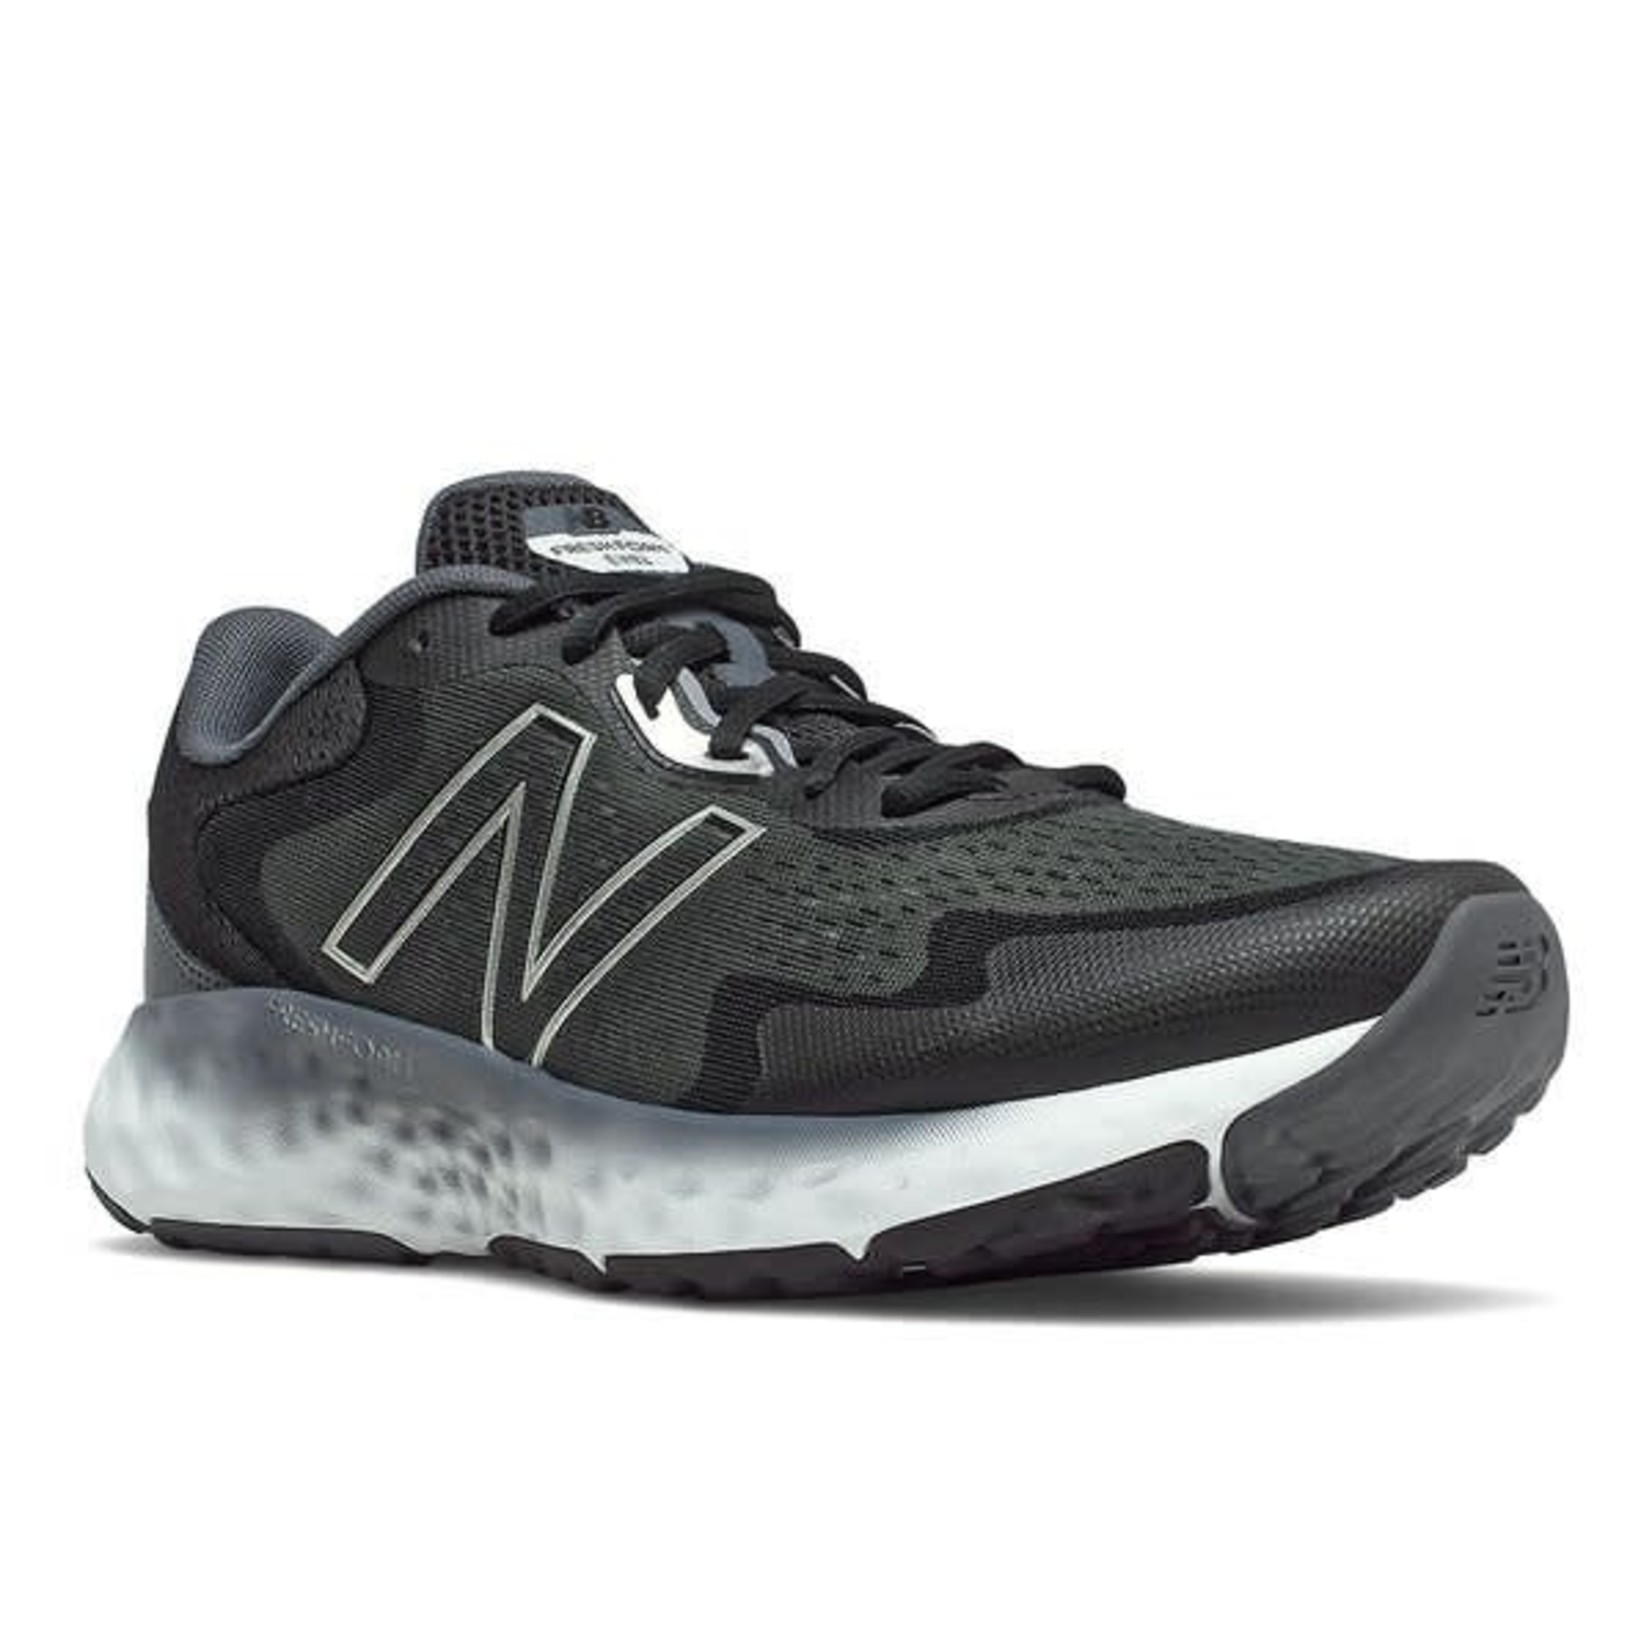 New Balance New Balance Running Shoes, Evoz, Mens